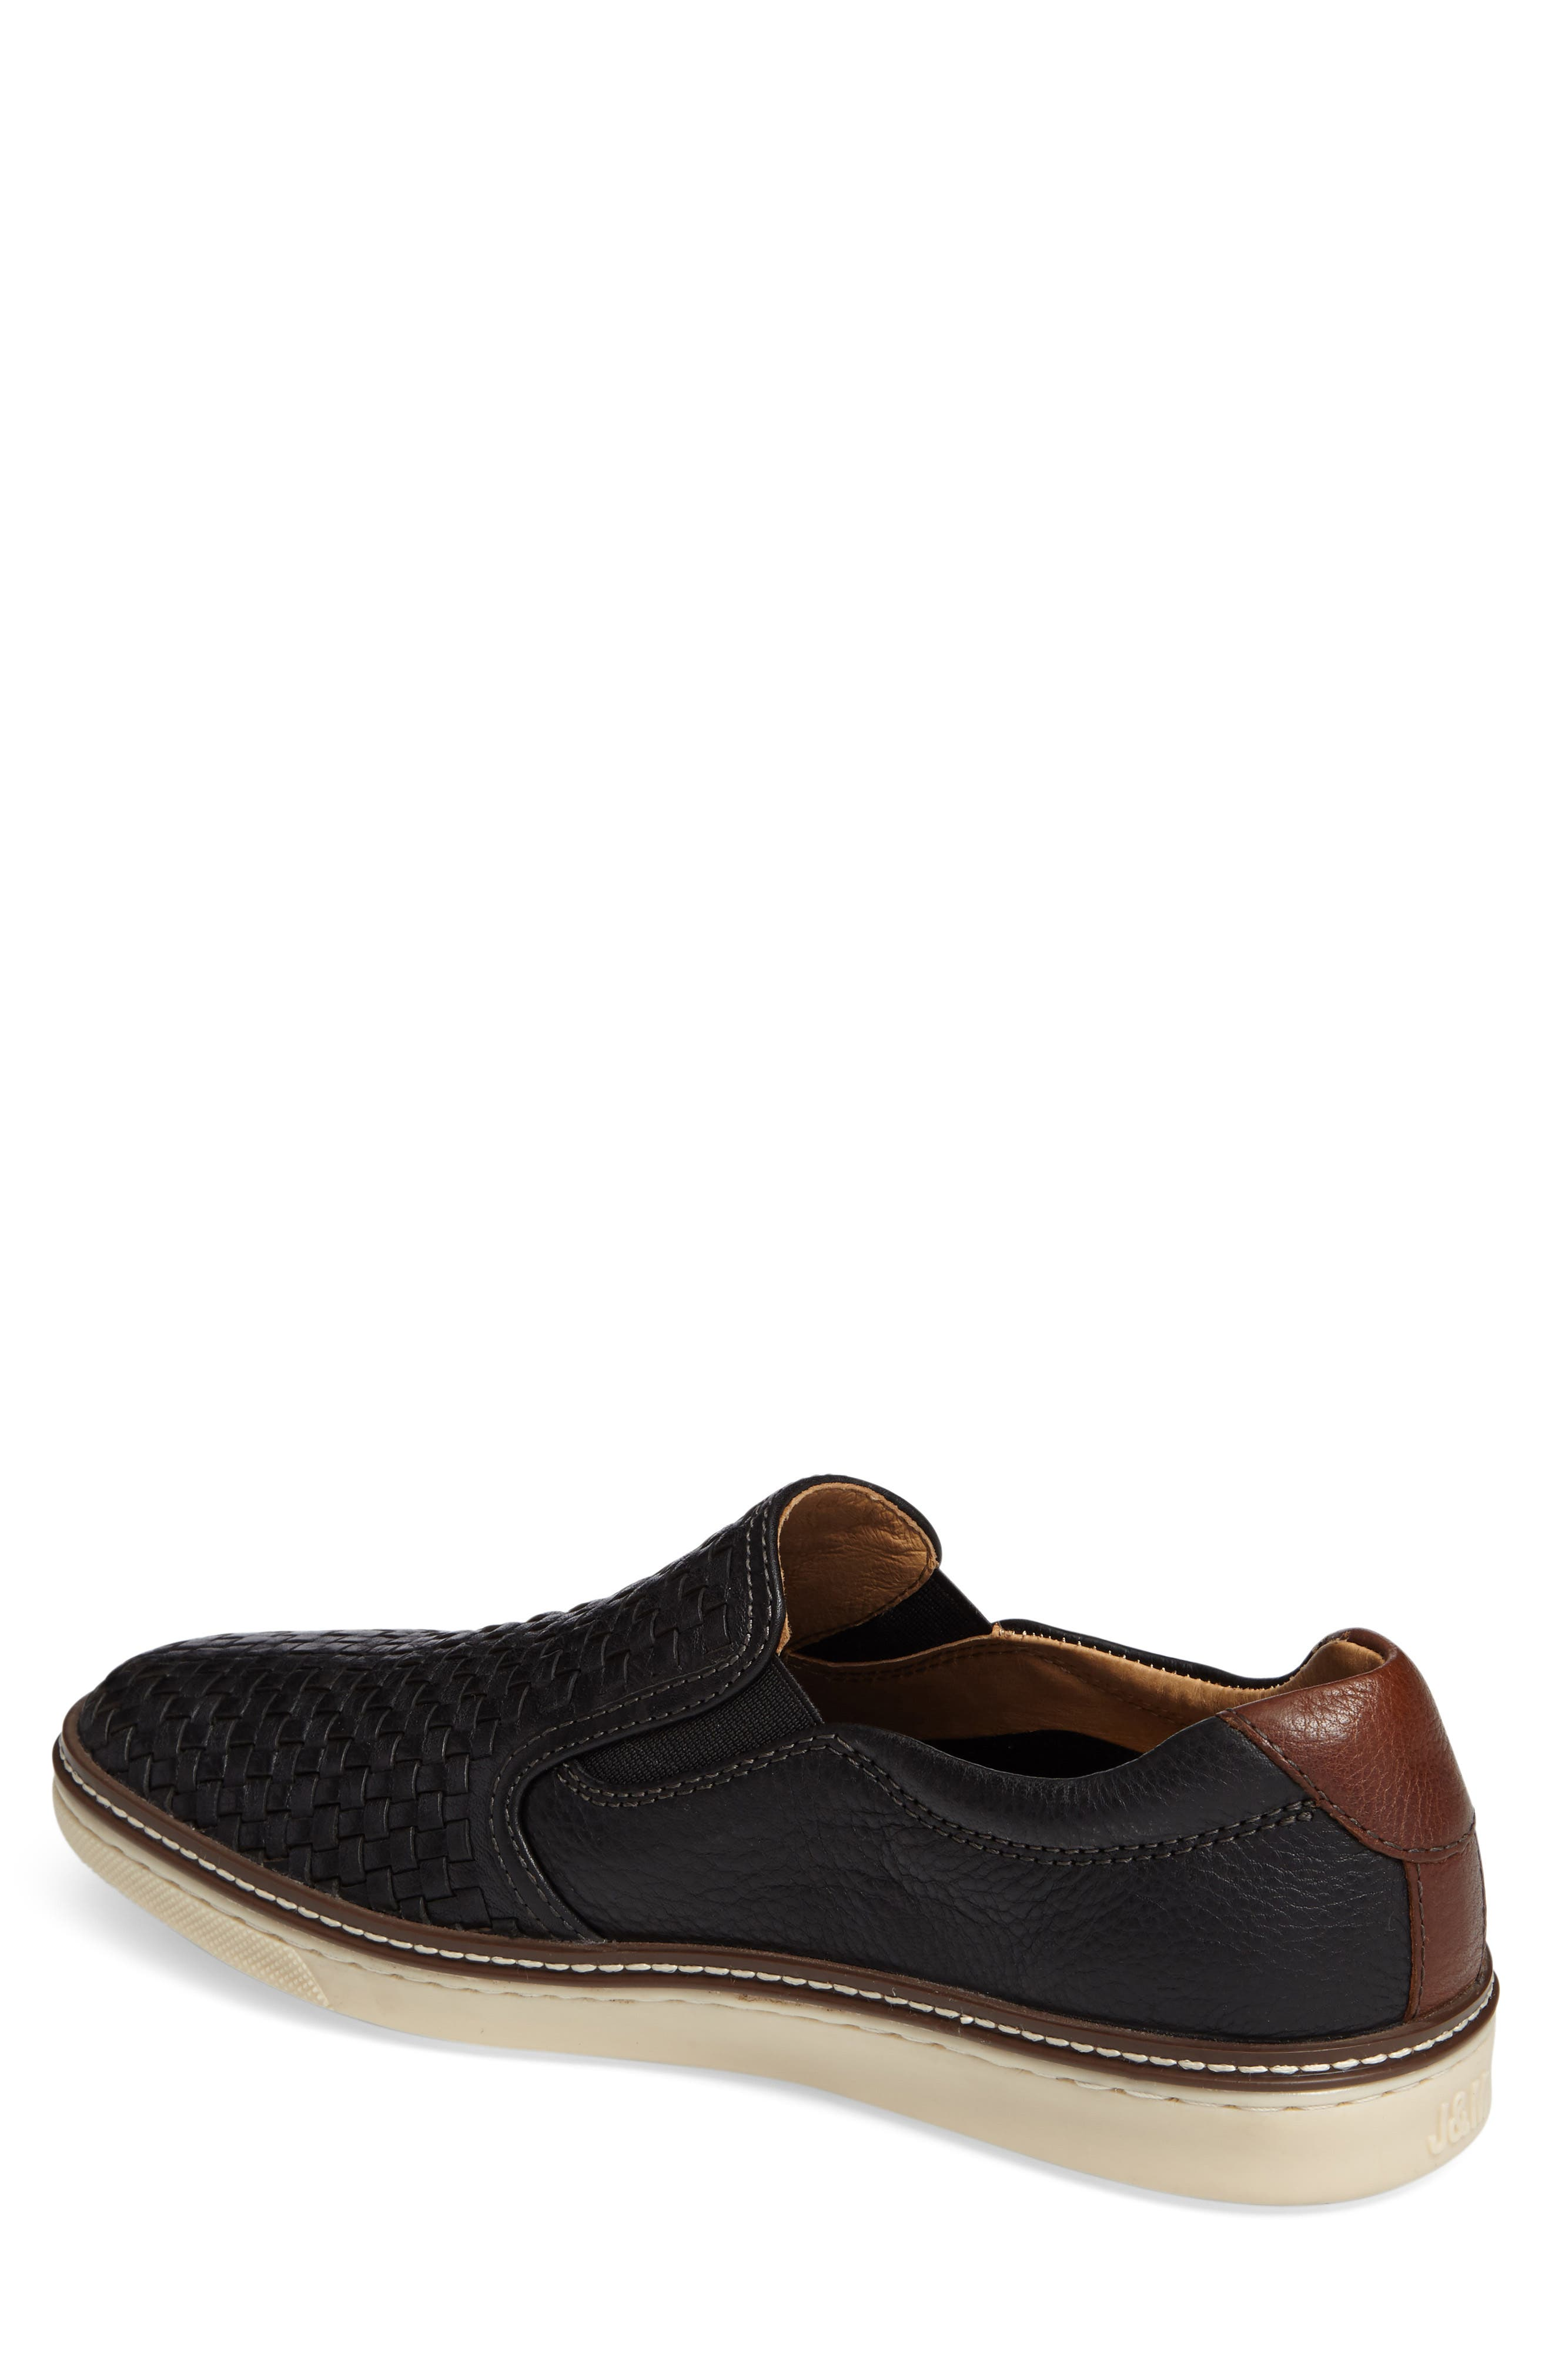 McGuffey Woven Slip-On Sneaker,                             Alternate thumbnail 2, color,                             BLACK LEATHER